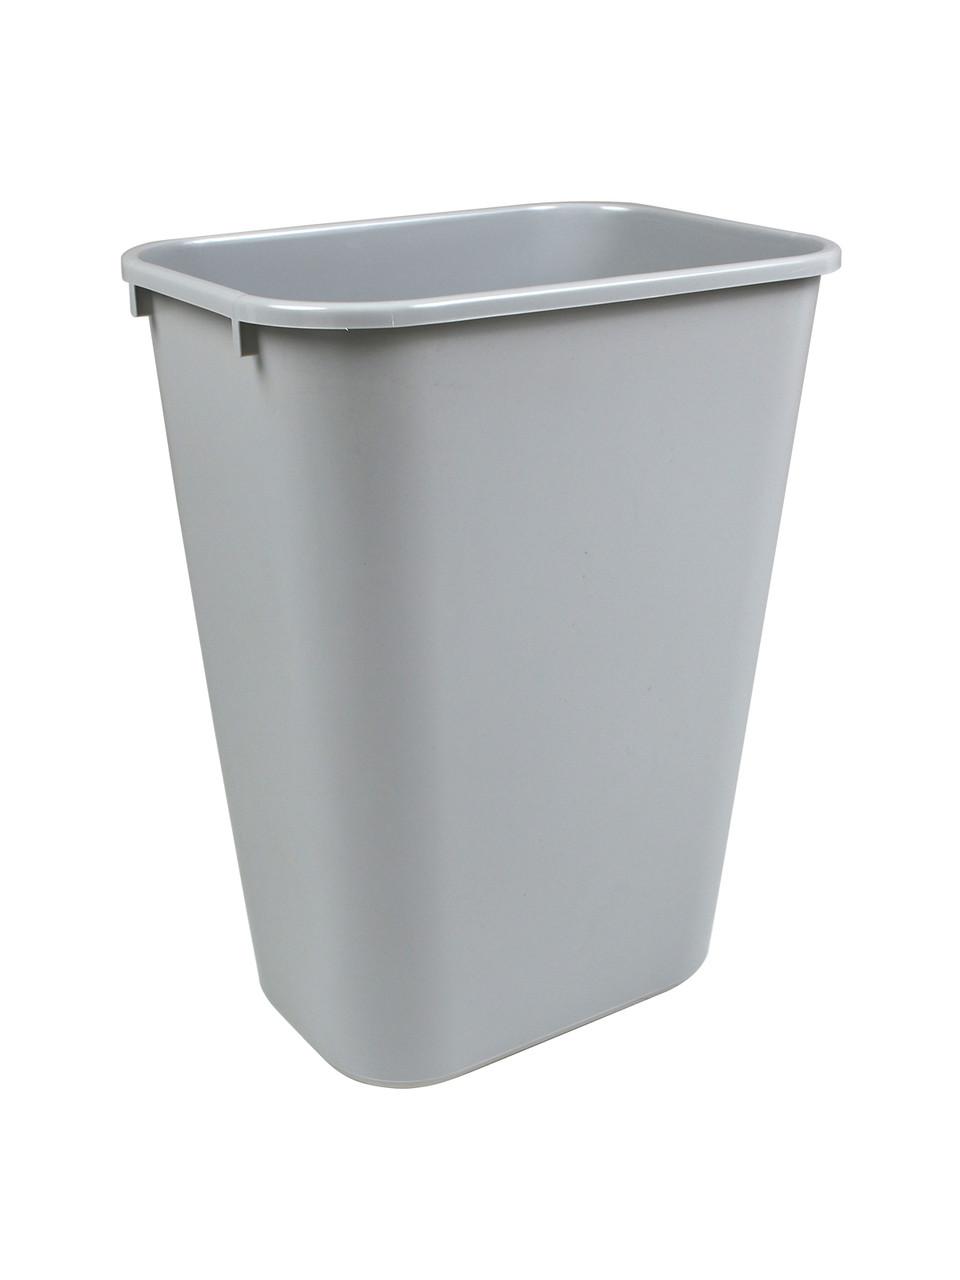 41 Quart Home or Office Plastic Wastebasket Gray